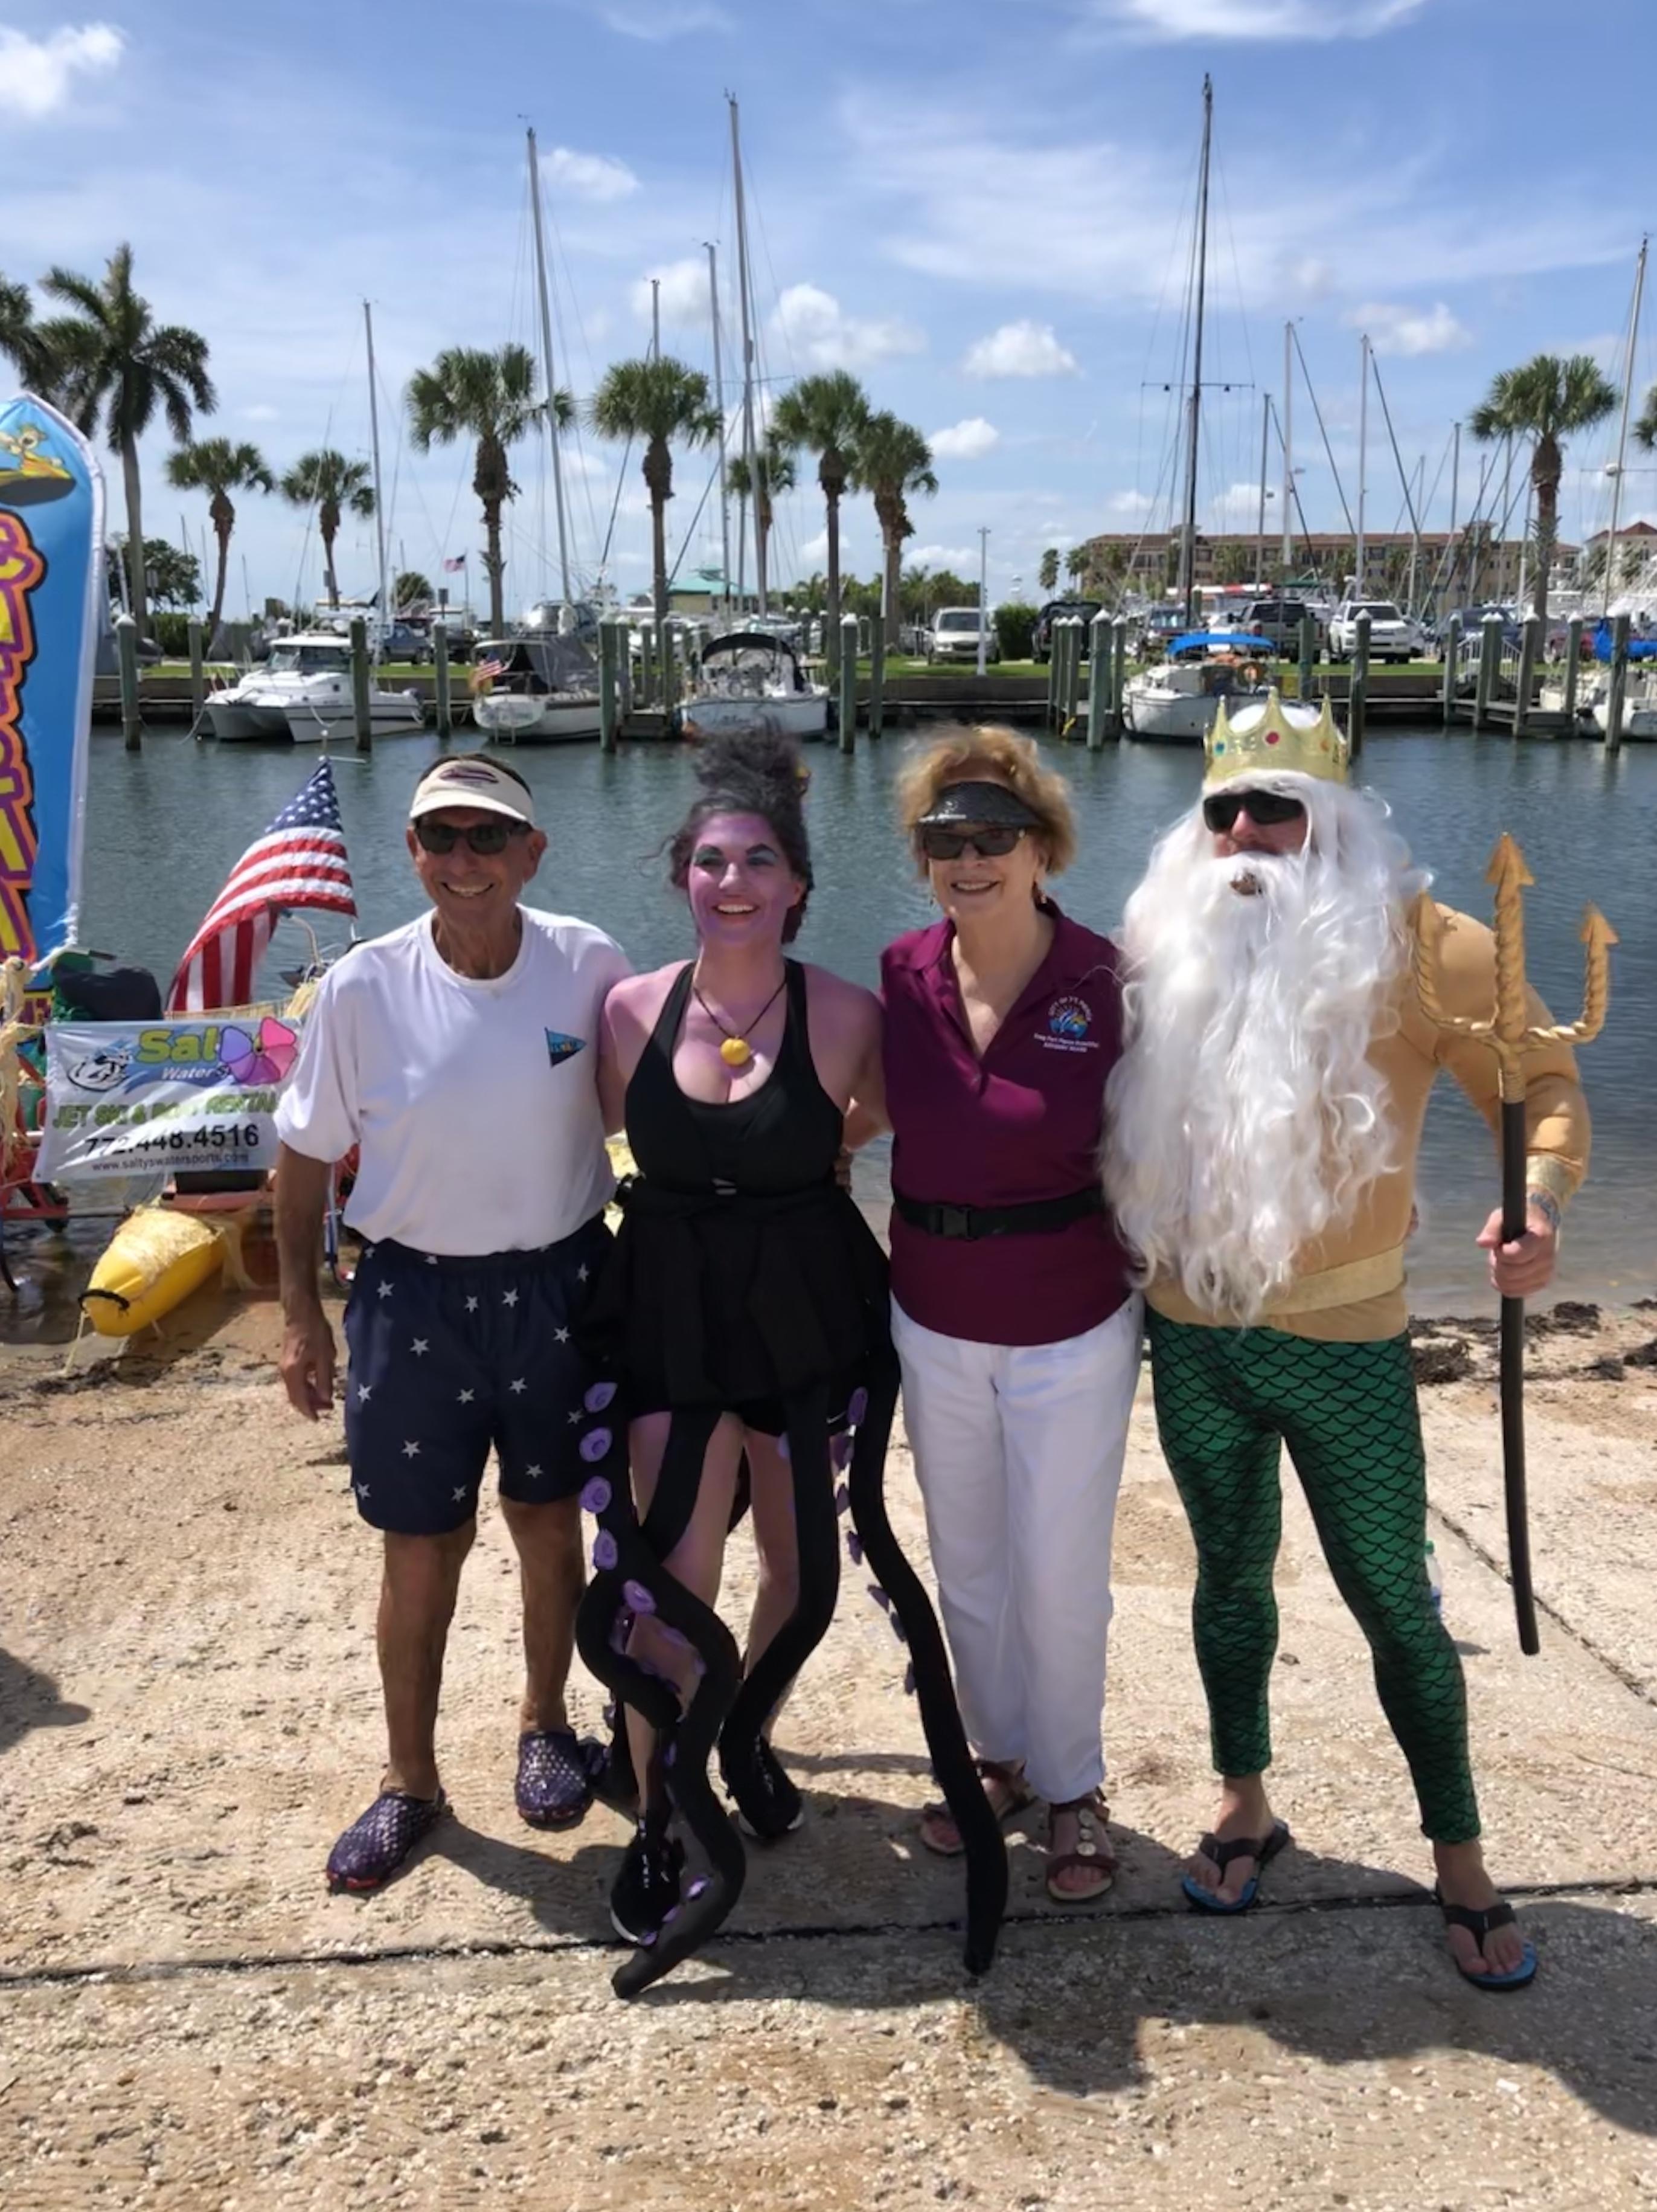 Derecktor Ft  Pierce Wins Top Honors at TCYSF River Raft Regatta